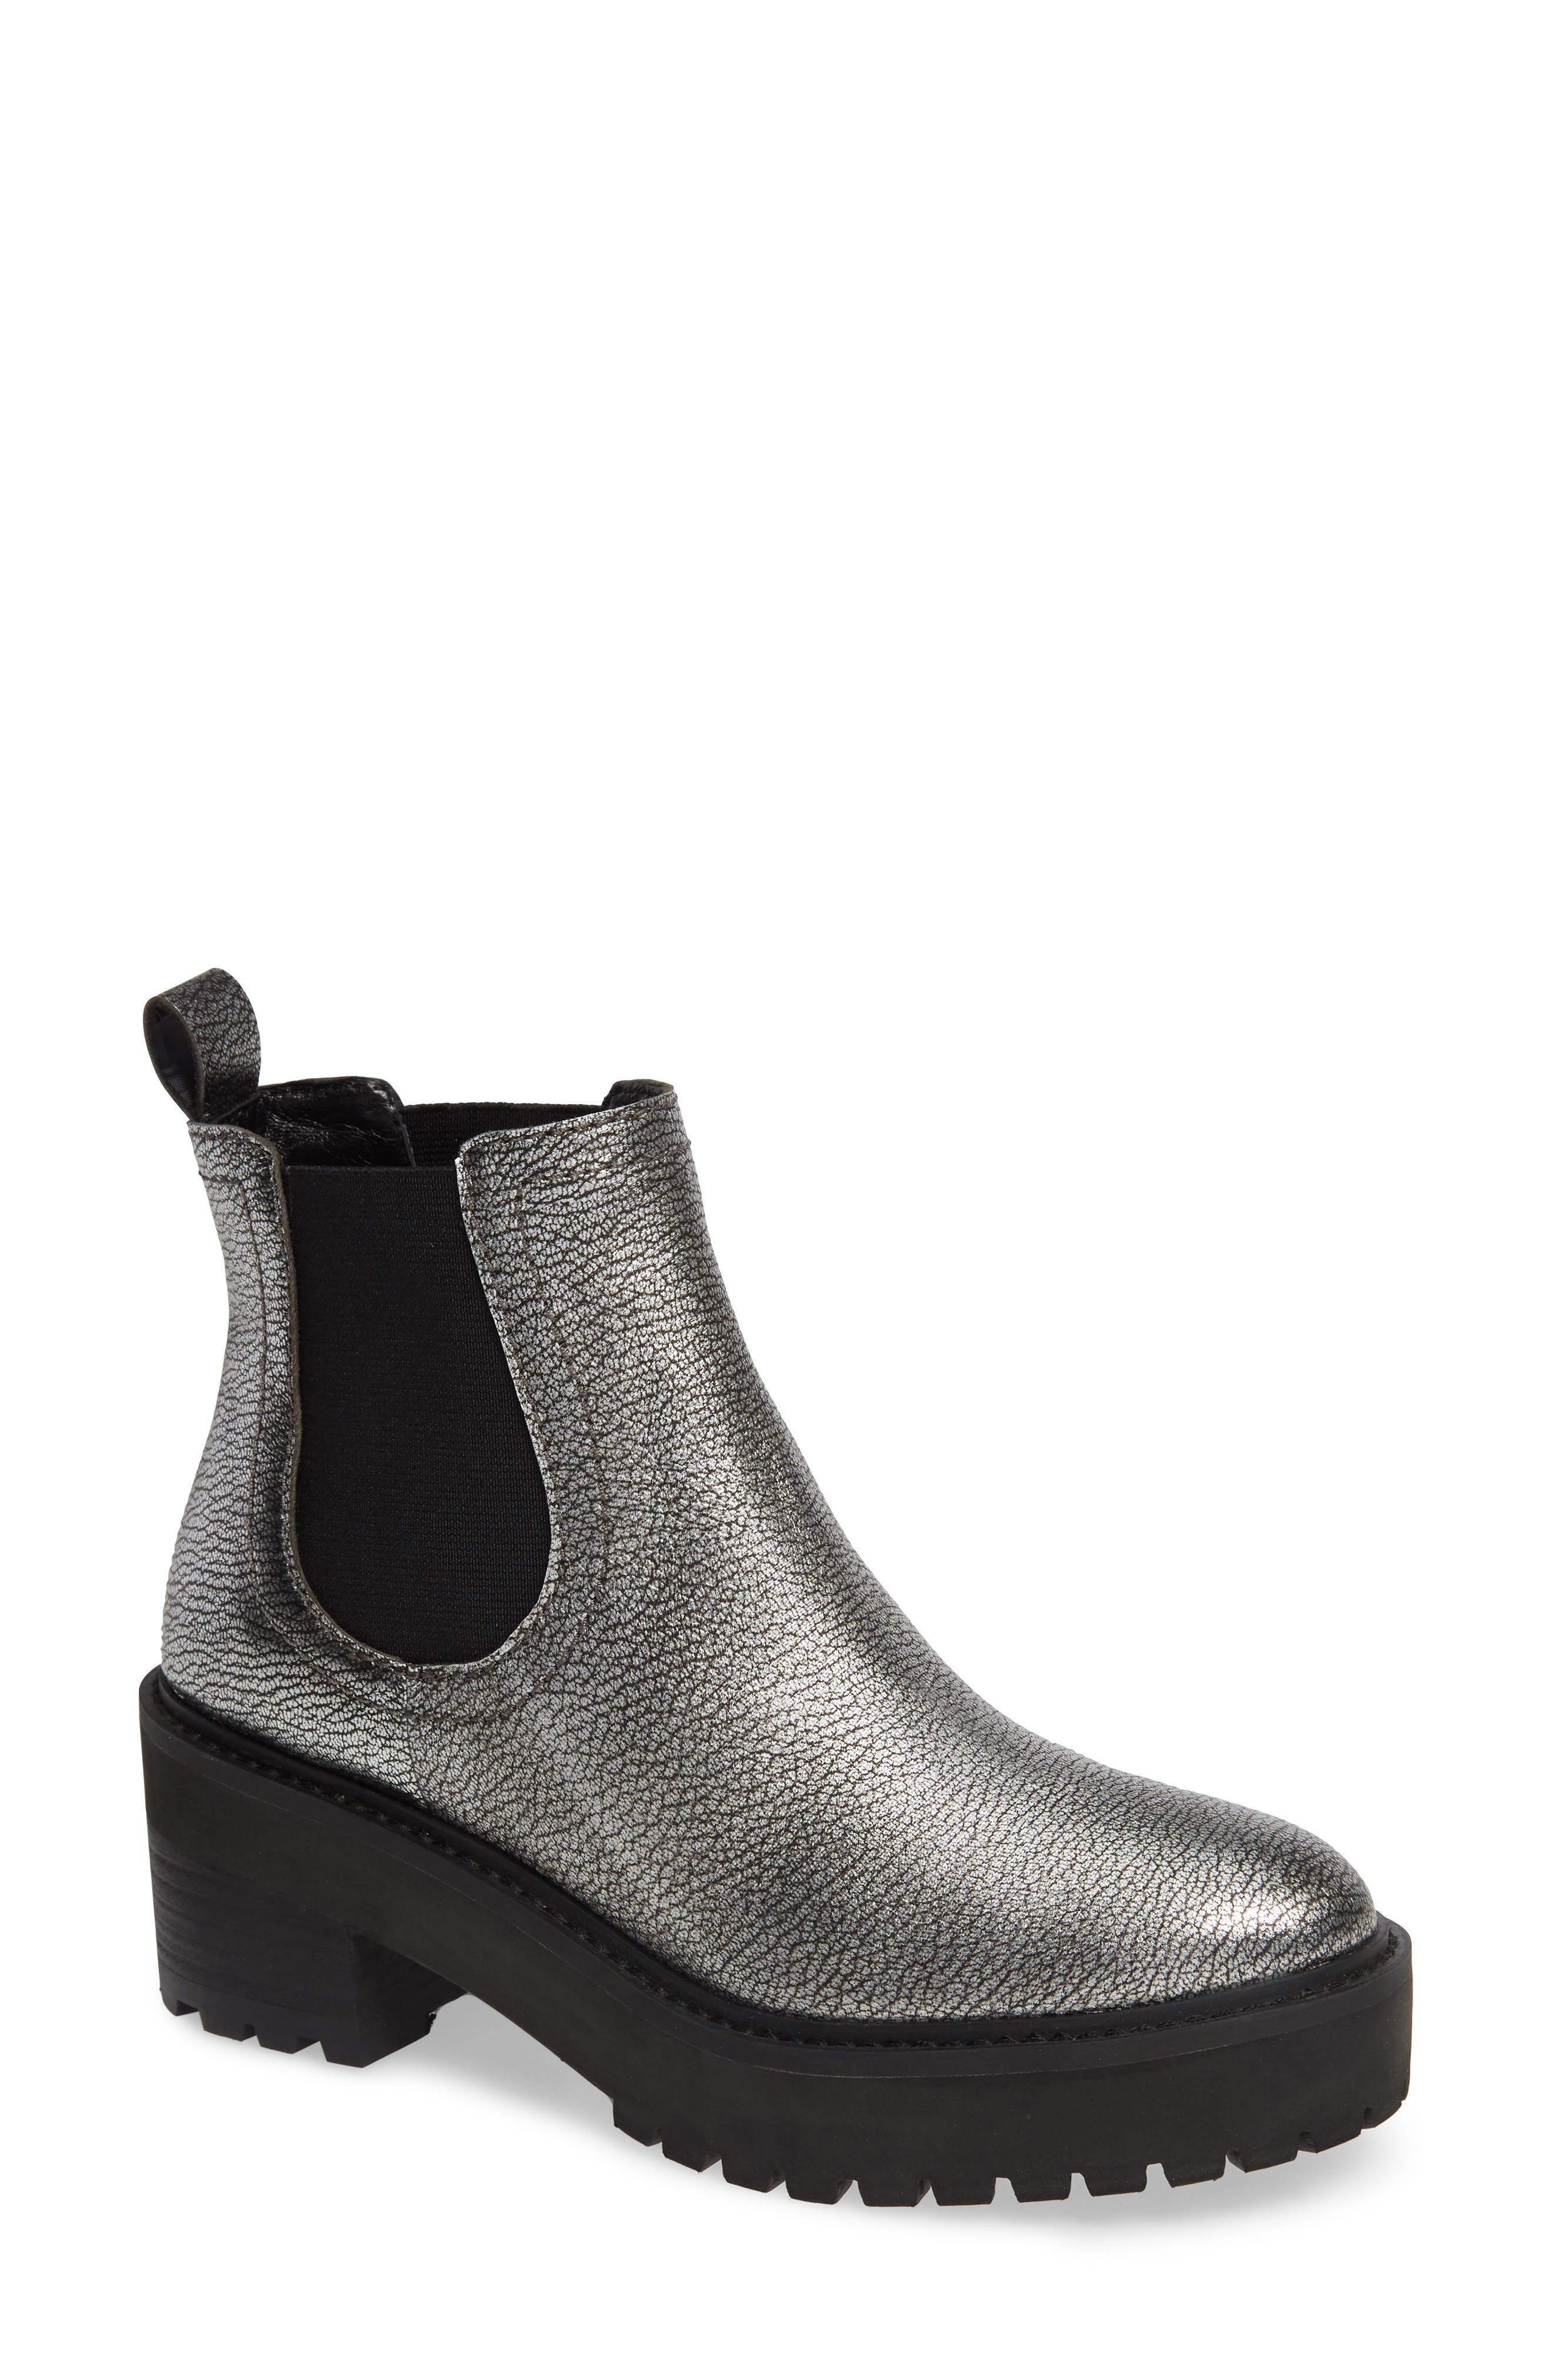 Linea Paolo Tate Platform Chelsea Boot- Metallic